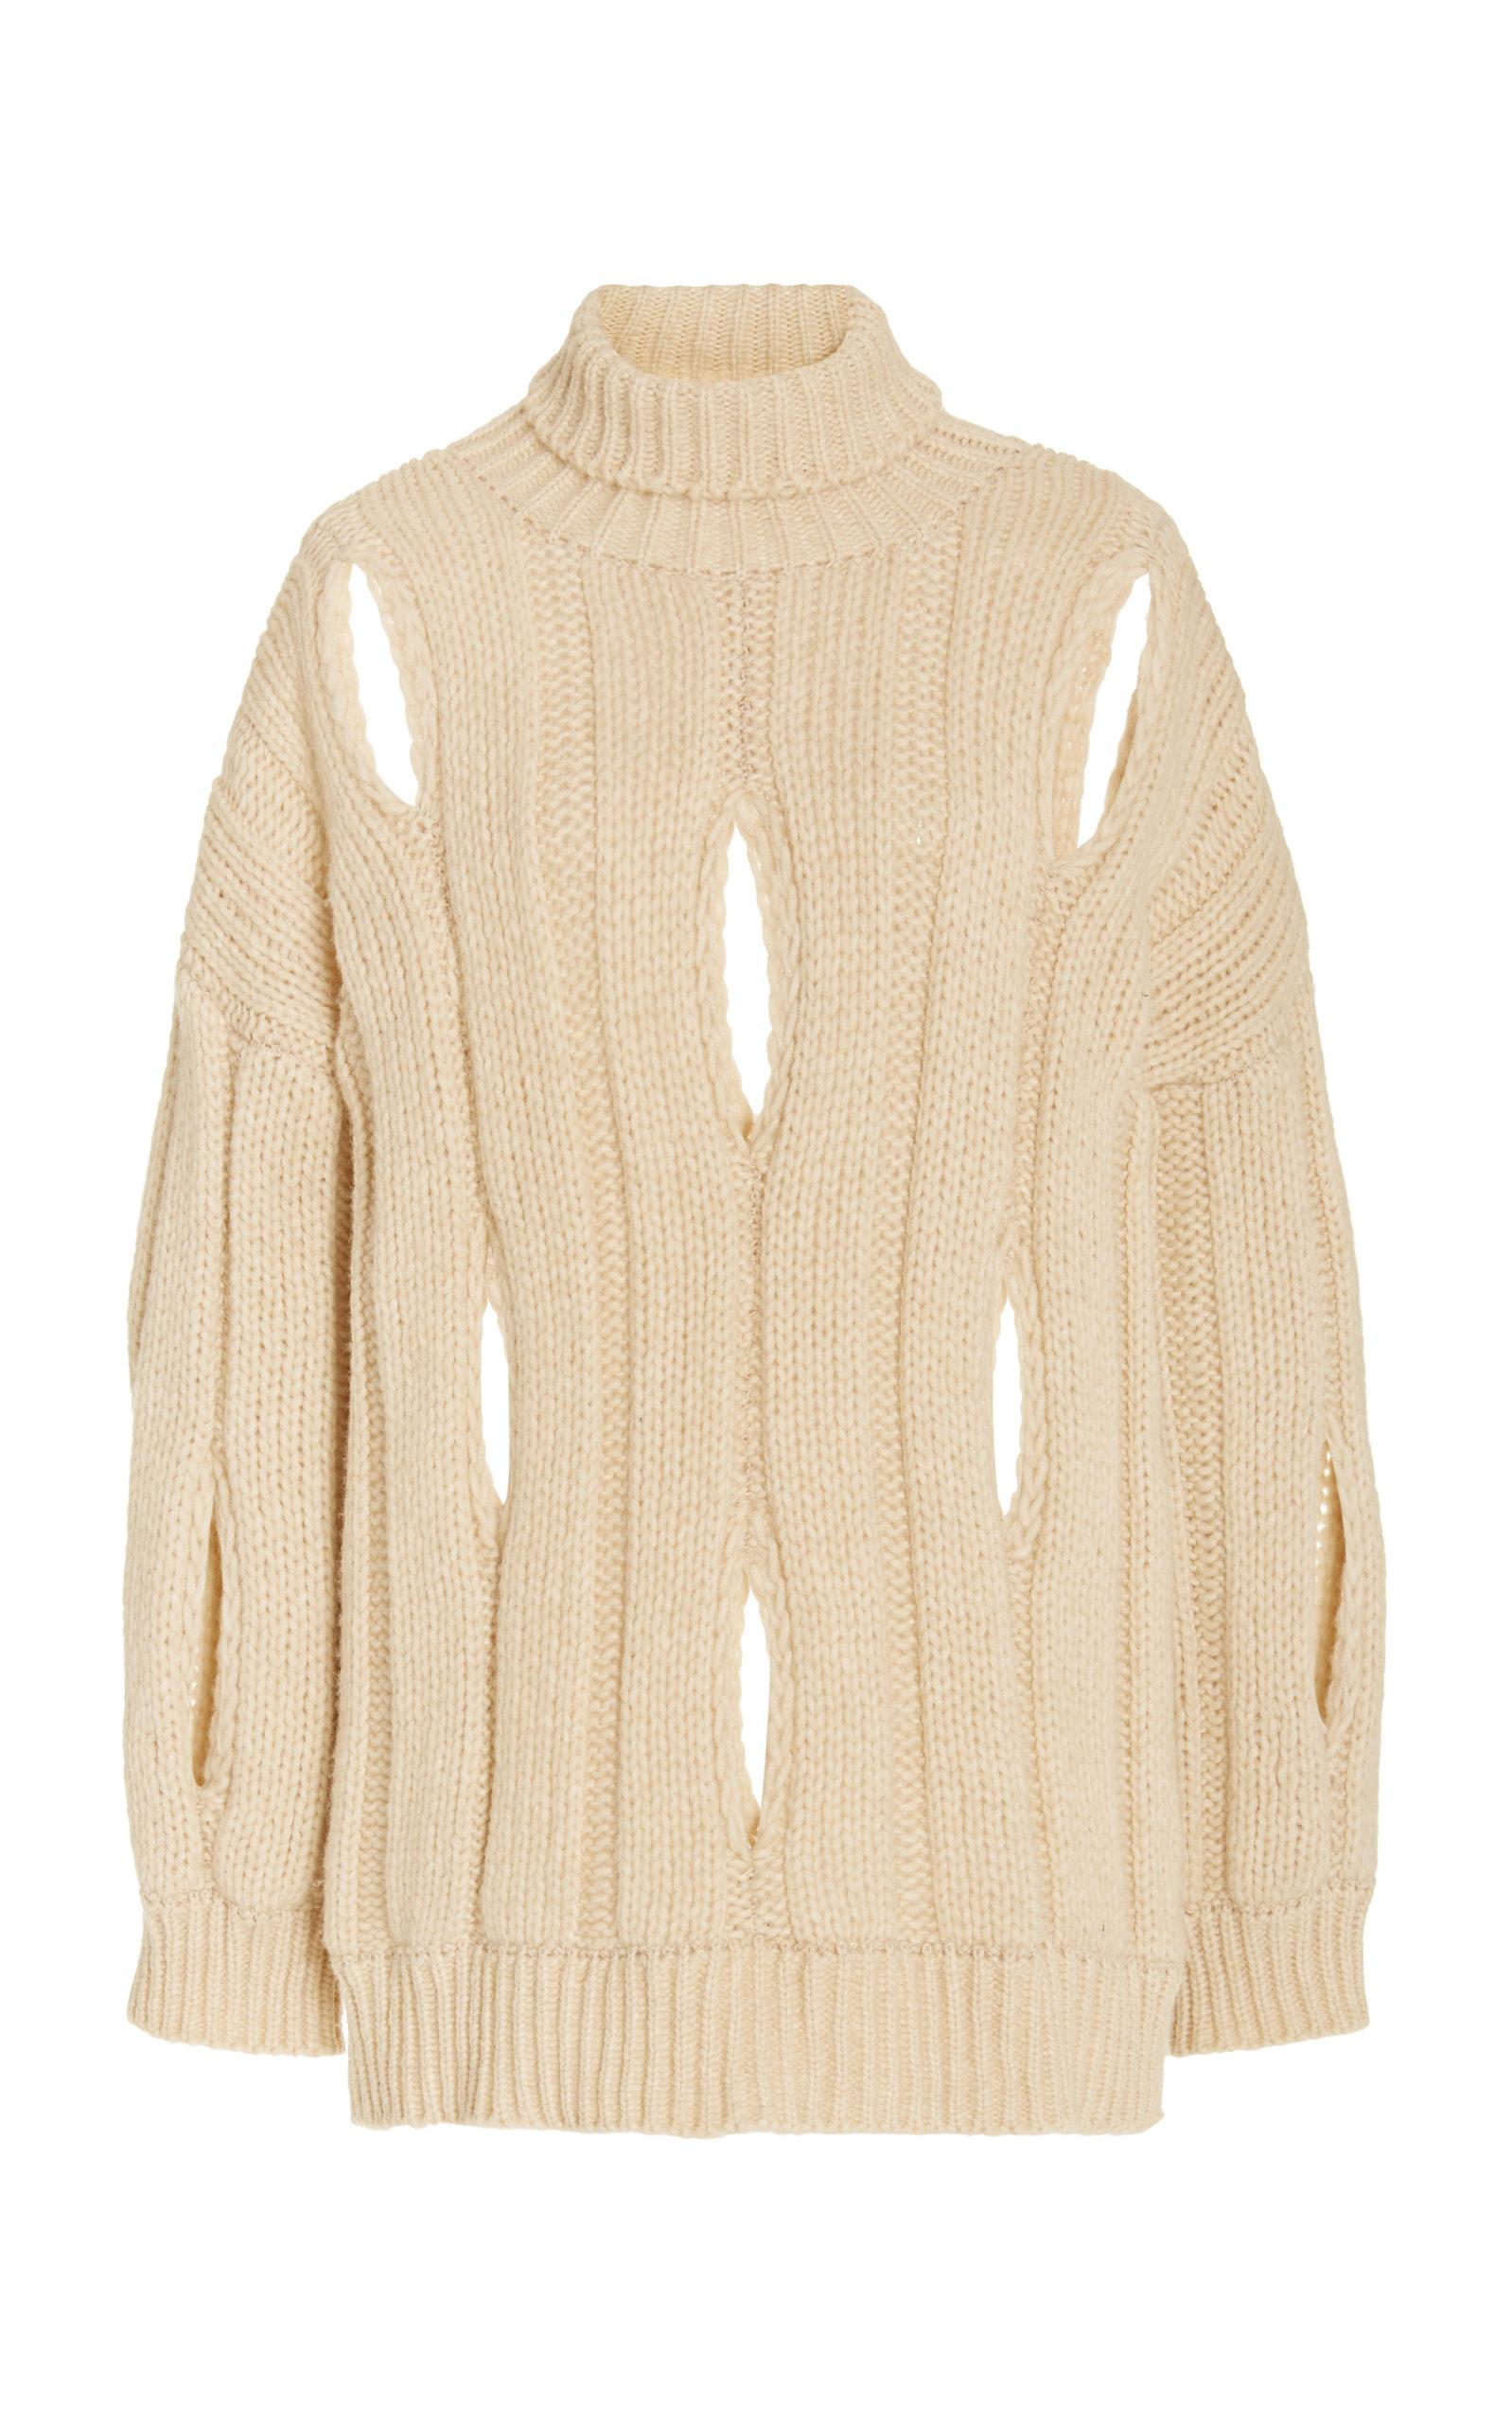 Women's Cocoon Cutout Knit Sweater